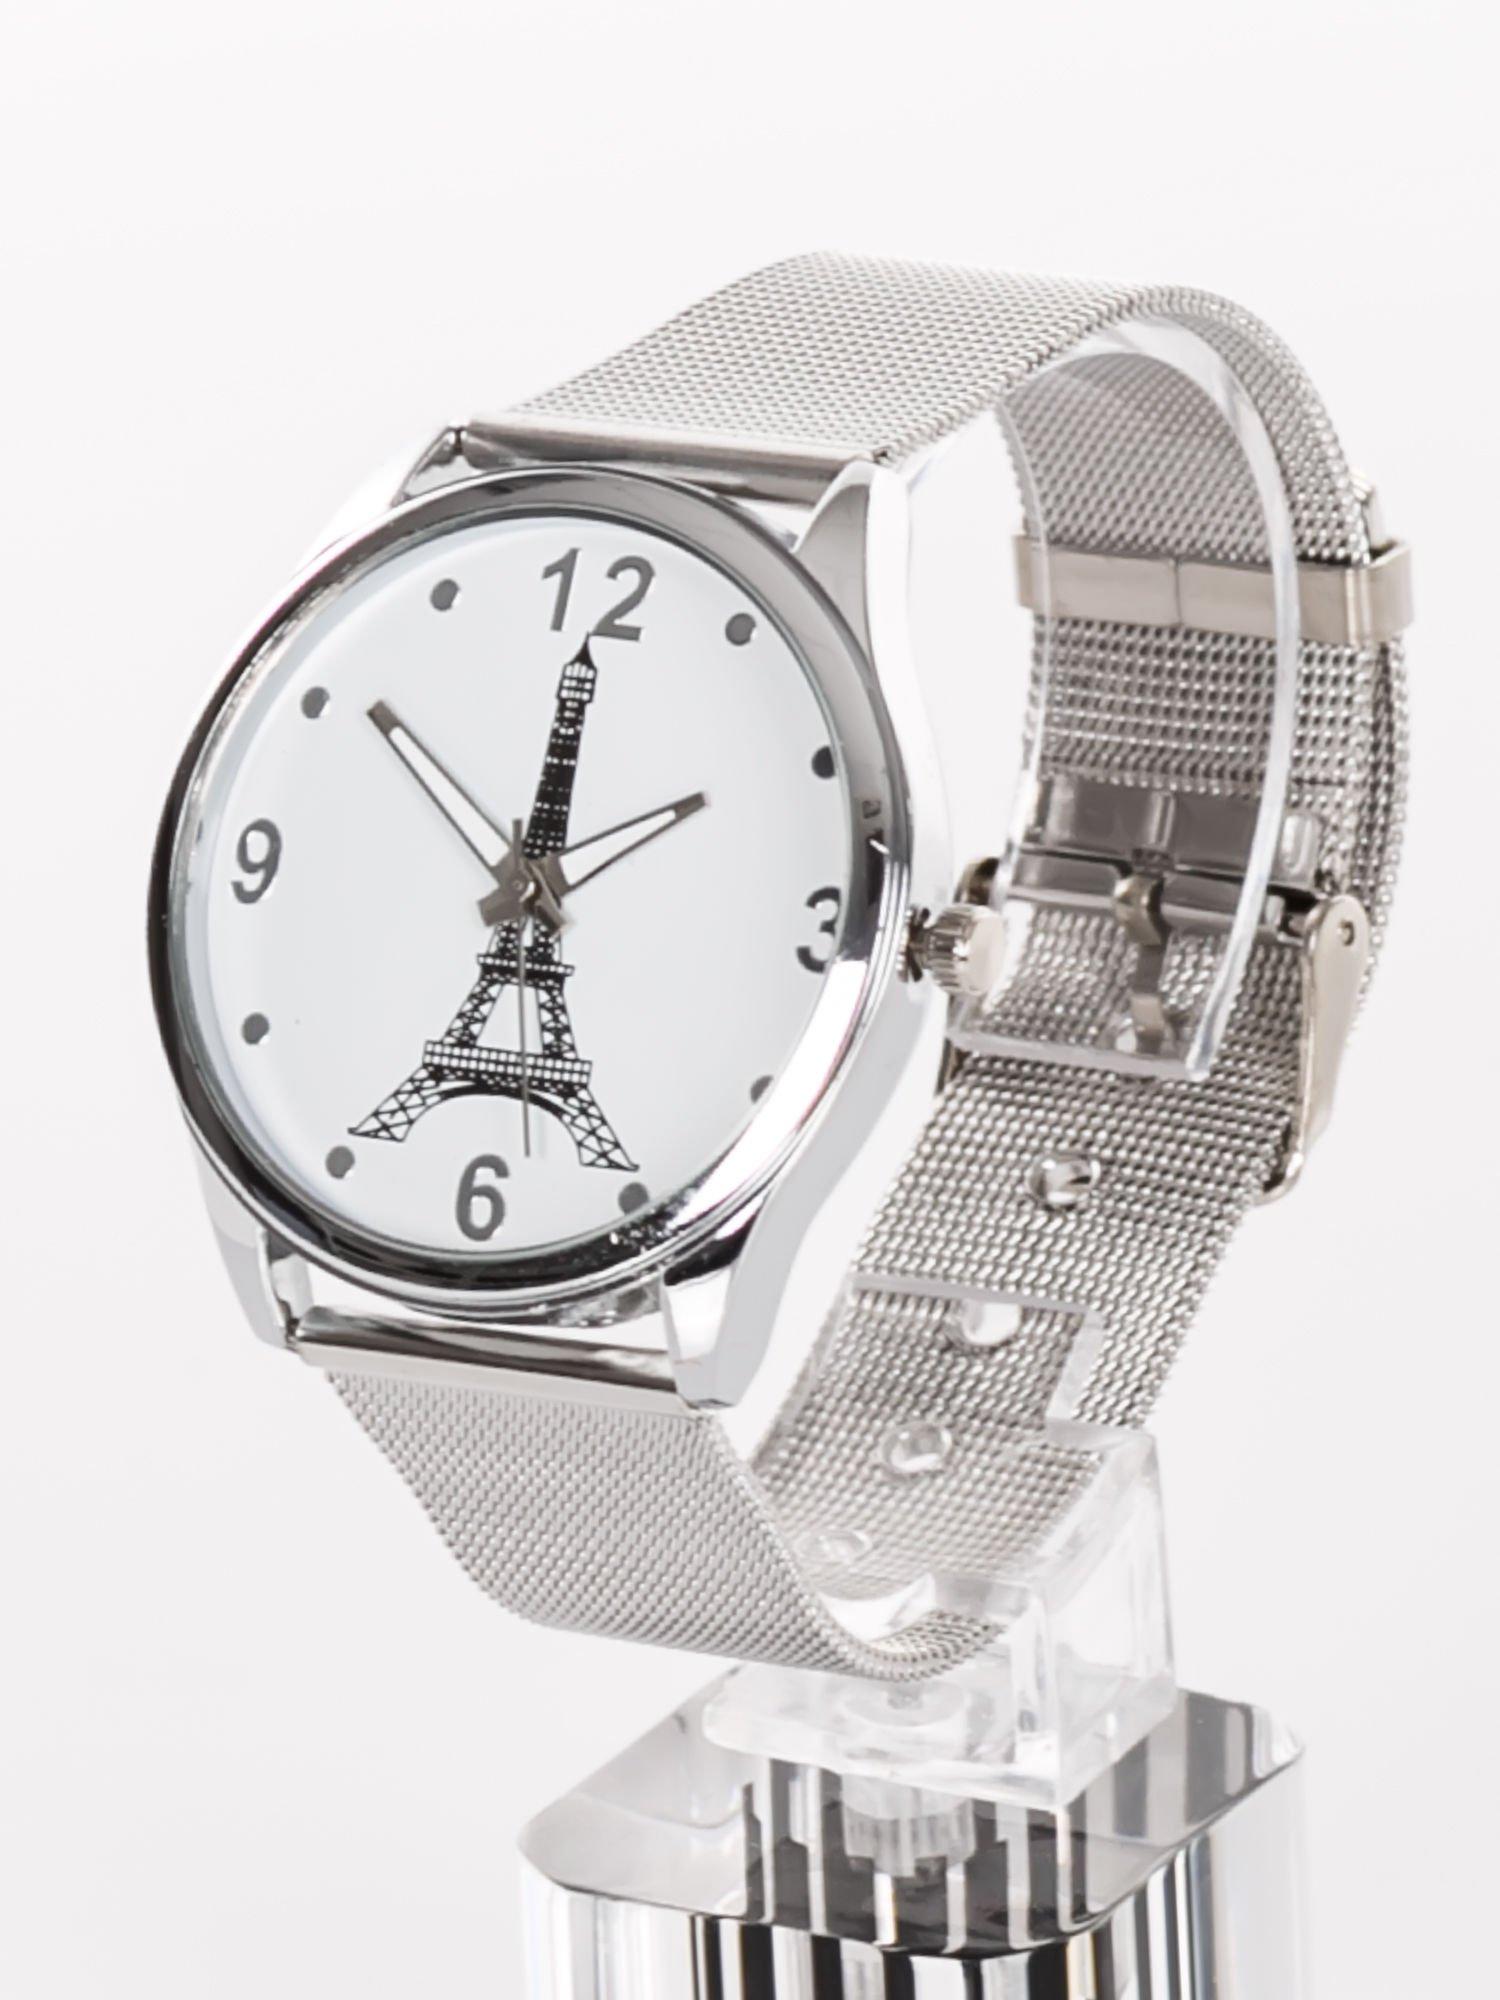 f09fbe14ef7c7f 1; GENEVA Eiffel Tower -Klasyka i elegancja srebrny damski zegarek z biała  tarczą ...